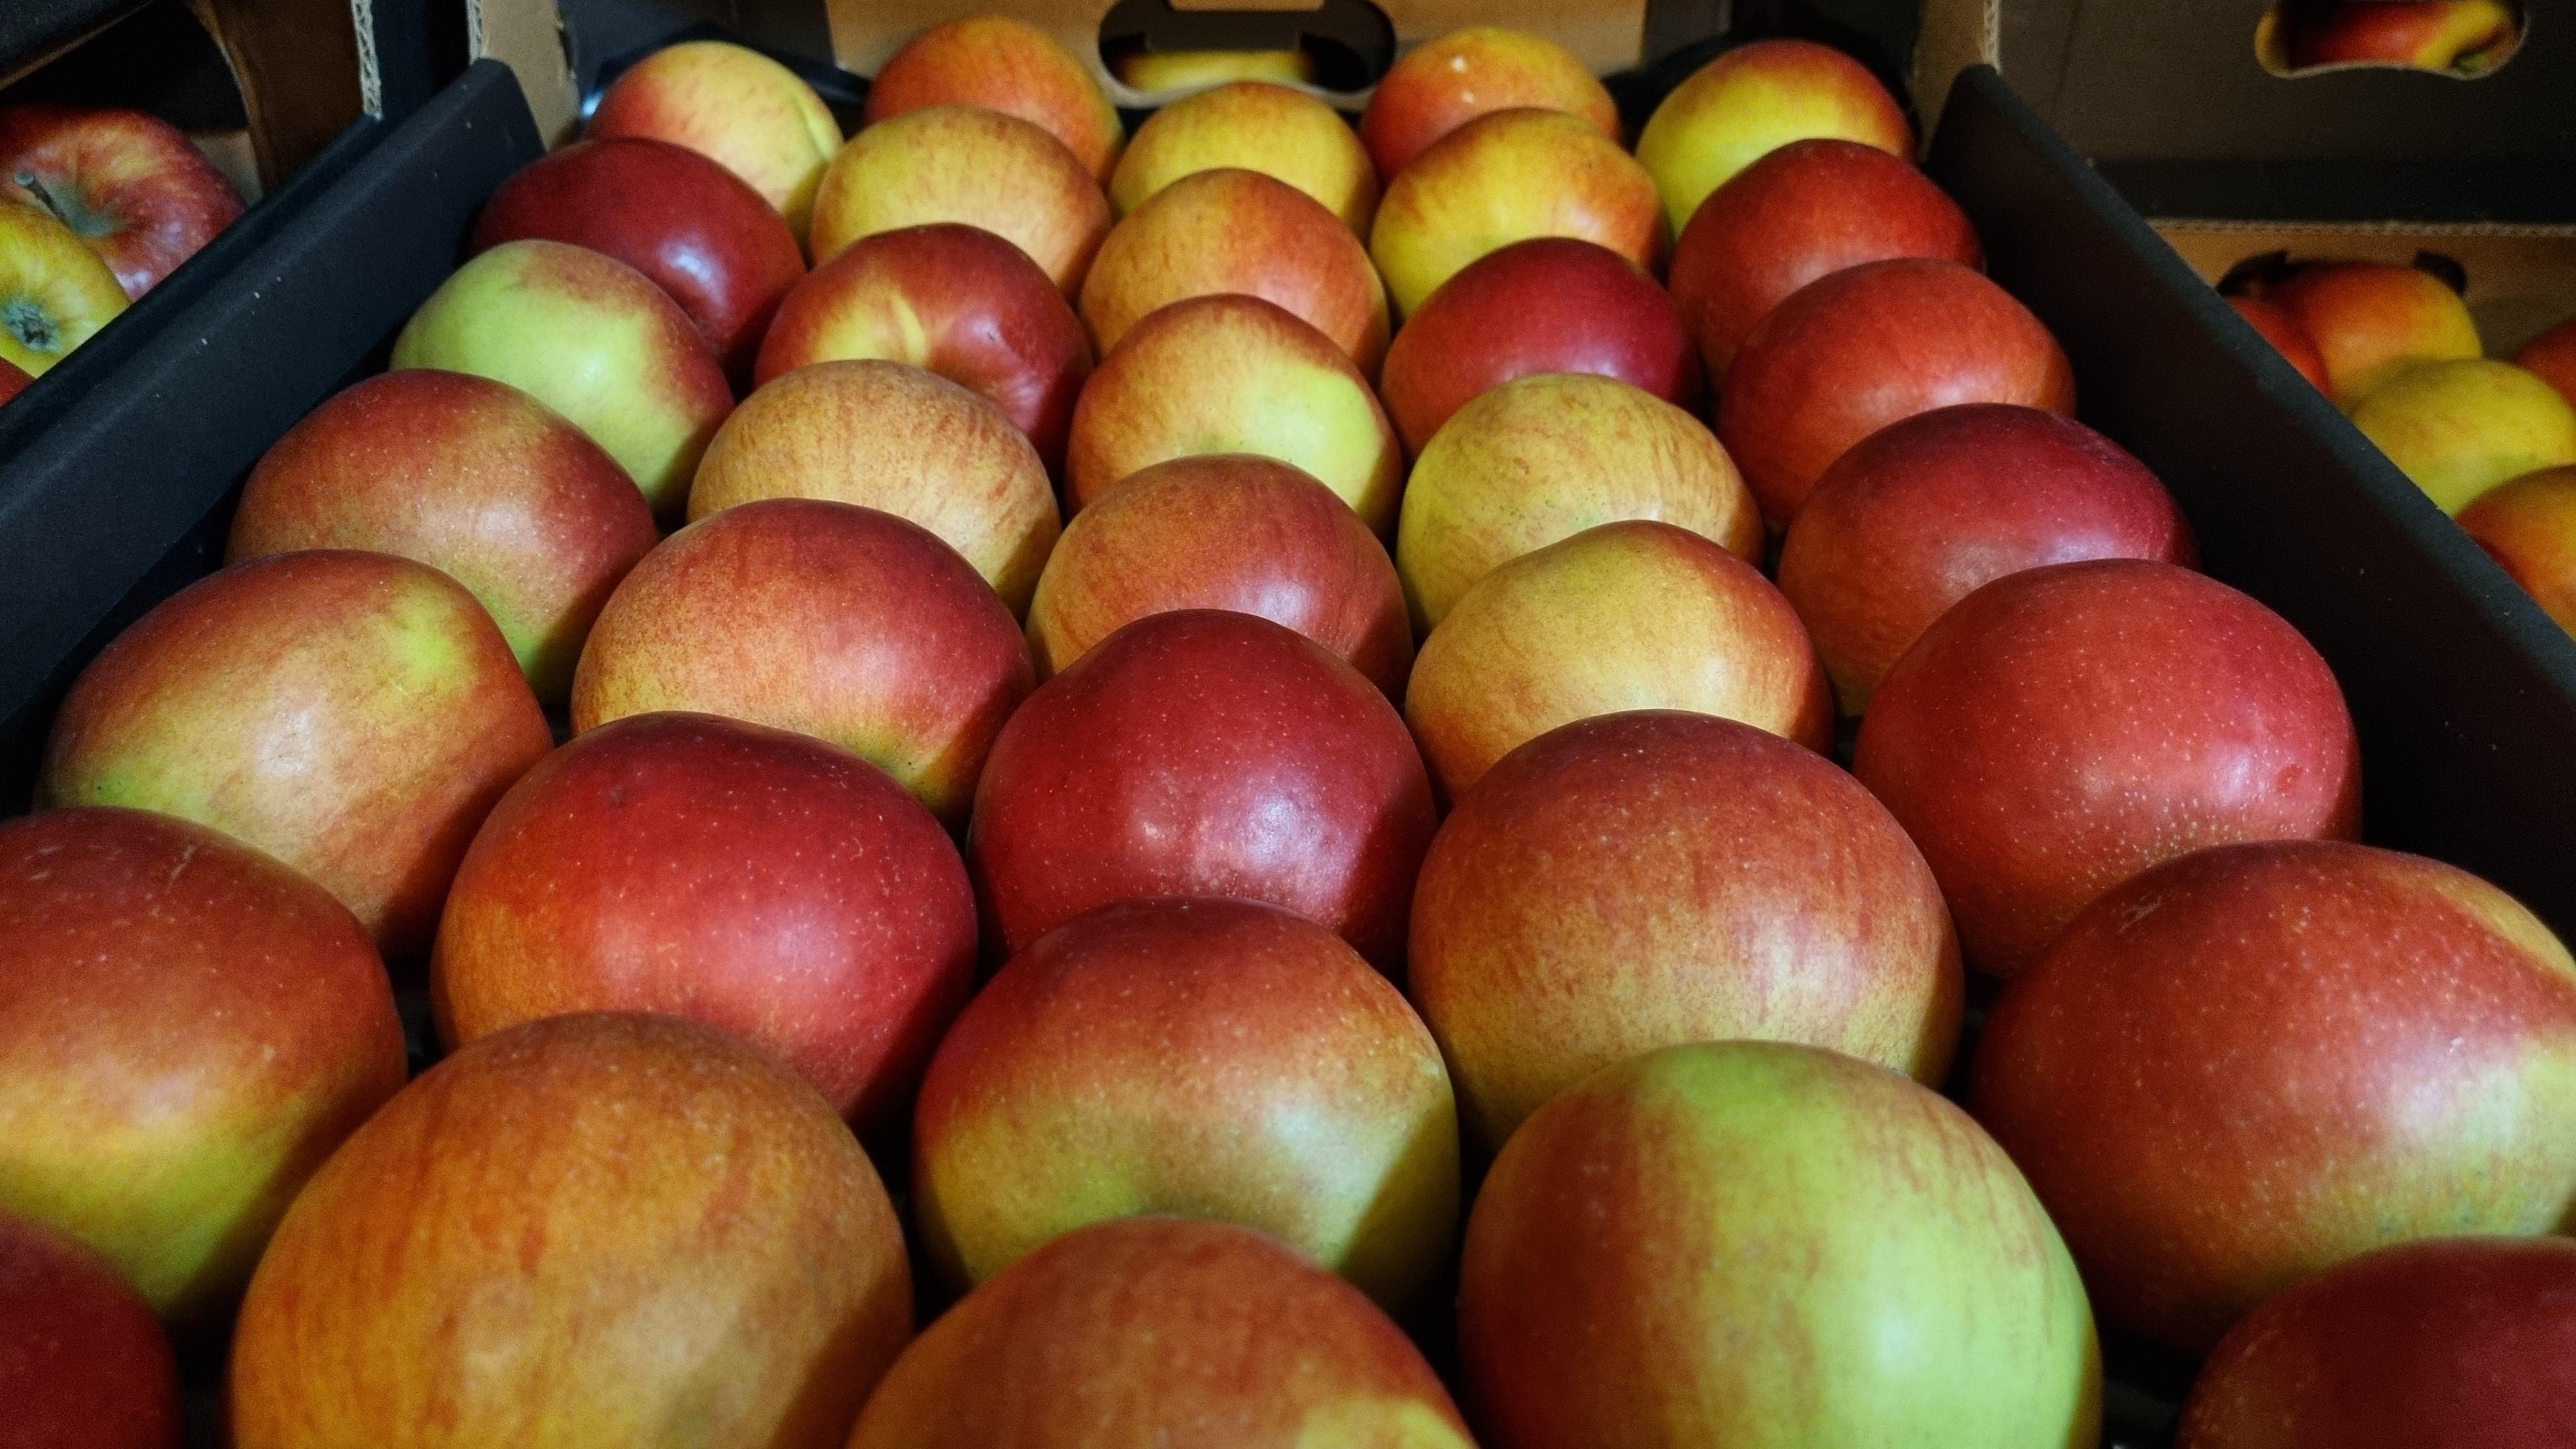 Jablko 70/80 červ. IDARED PLATO vybarvené 90%